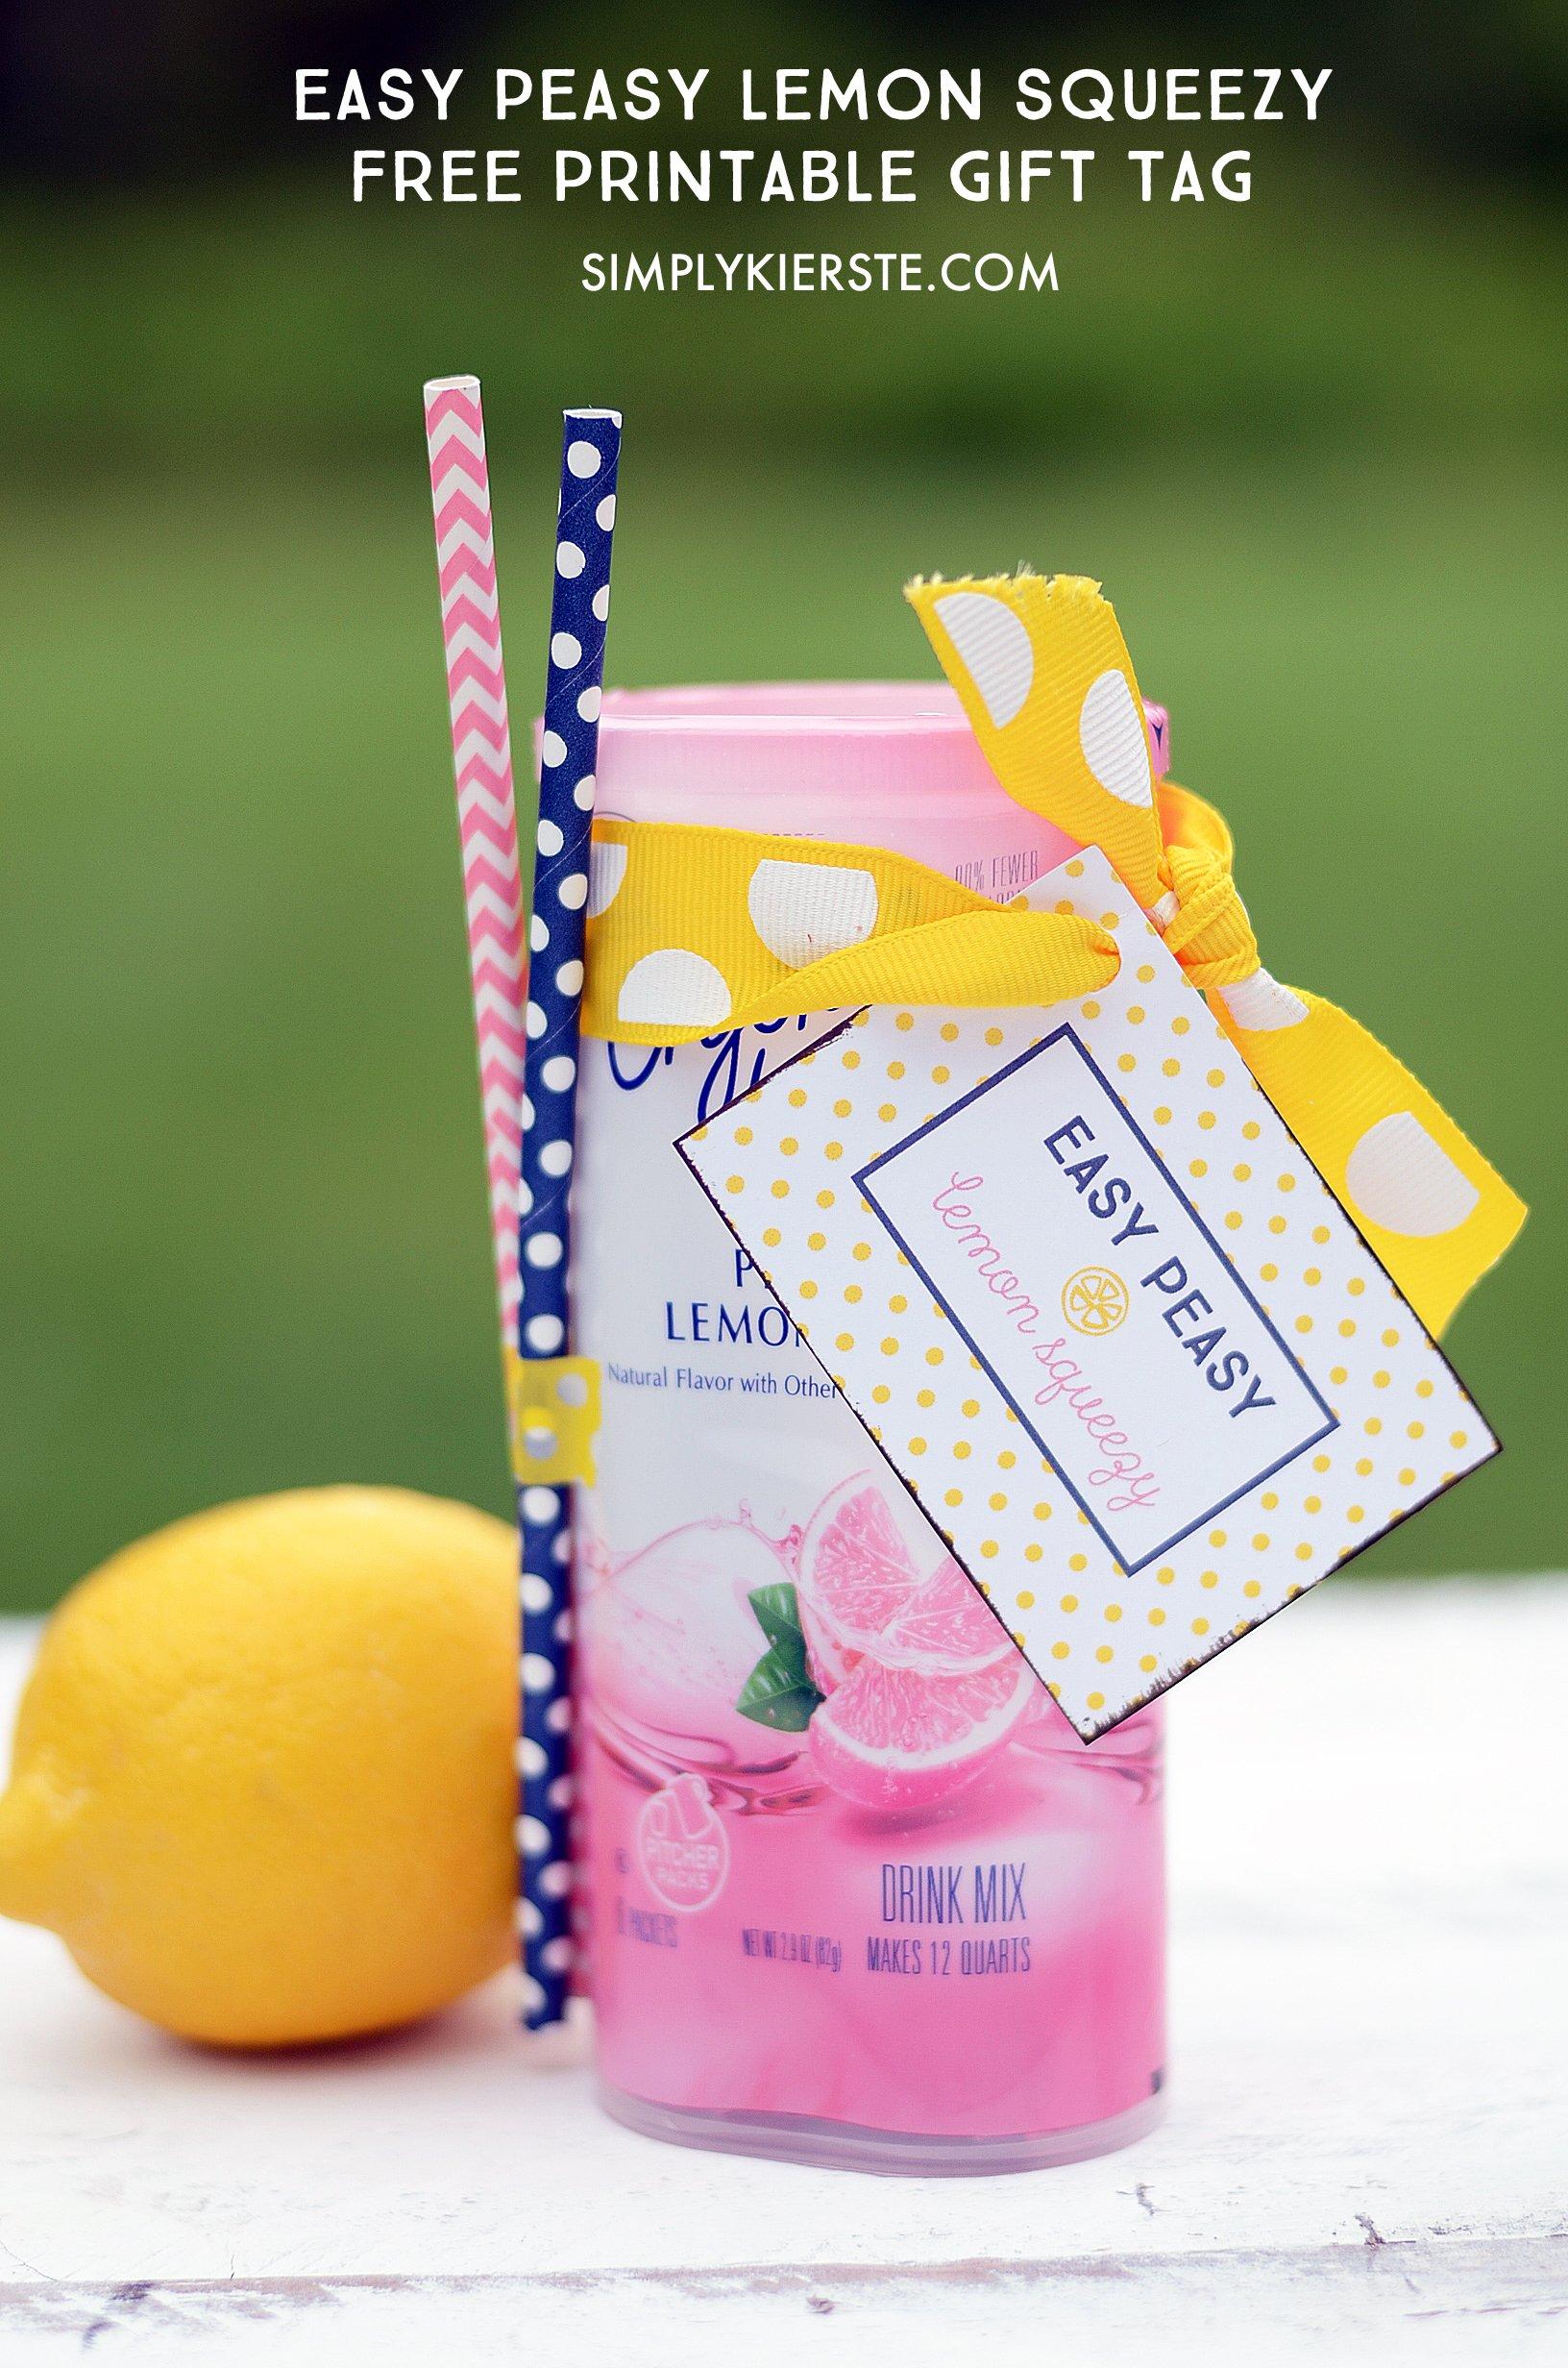 Easy peasy lemon squeeze...fun printable gift tag | simplykierste.com